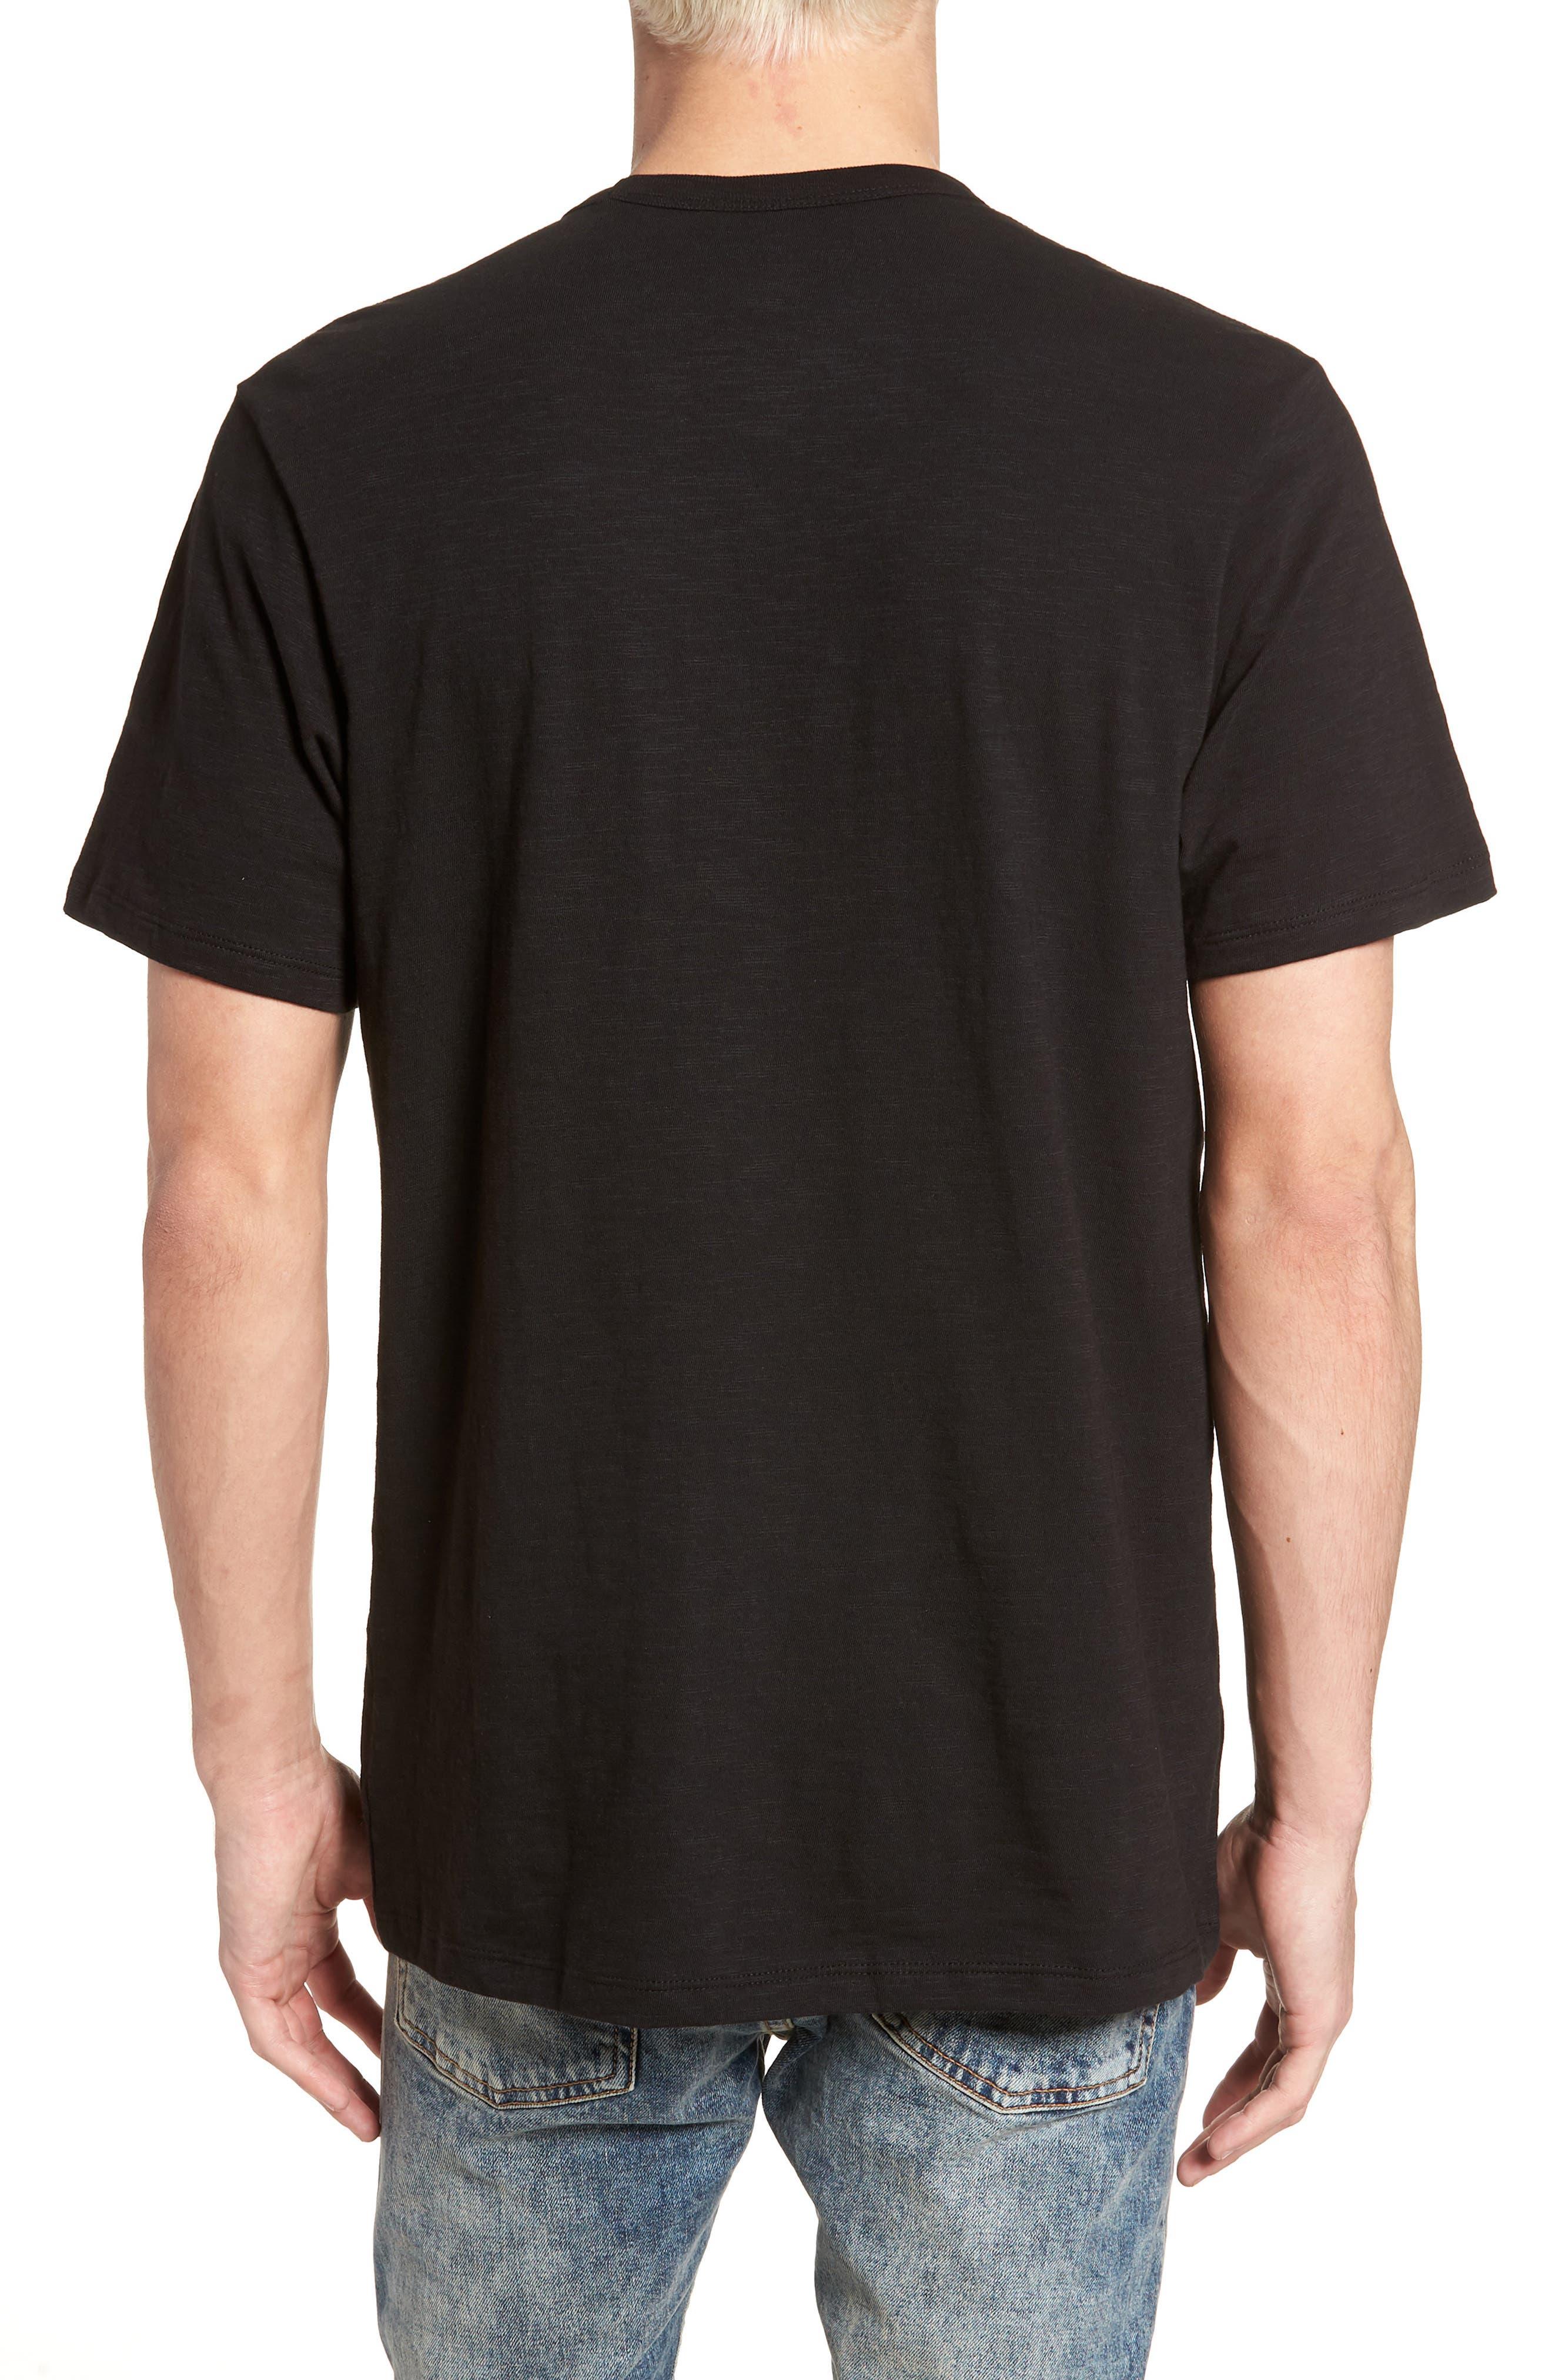 Grit Scrum San Francisco Giants T-Shirt,                             Alternate thumbnail 2, color,                             Jet Black